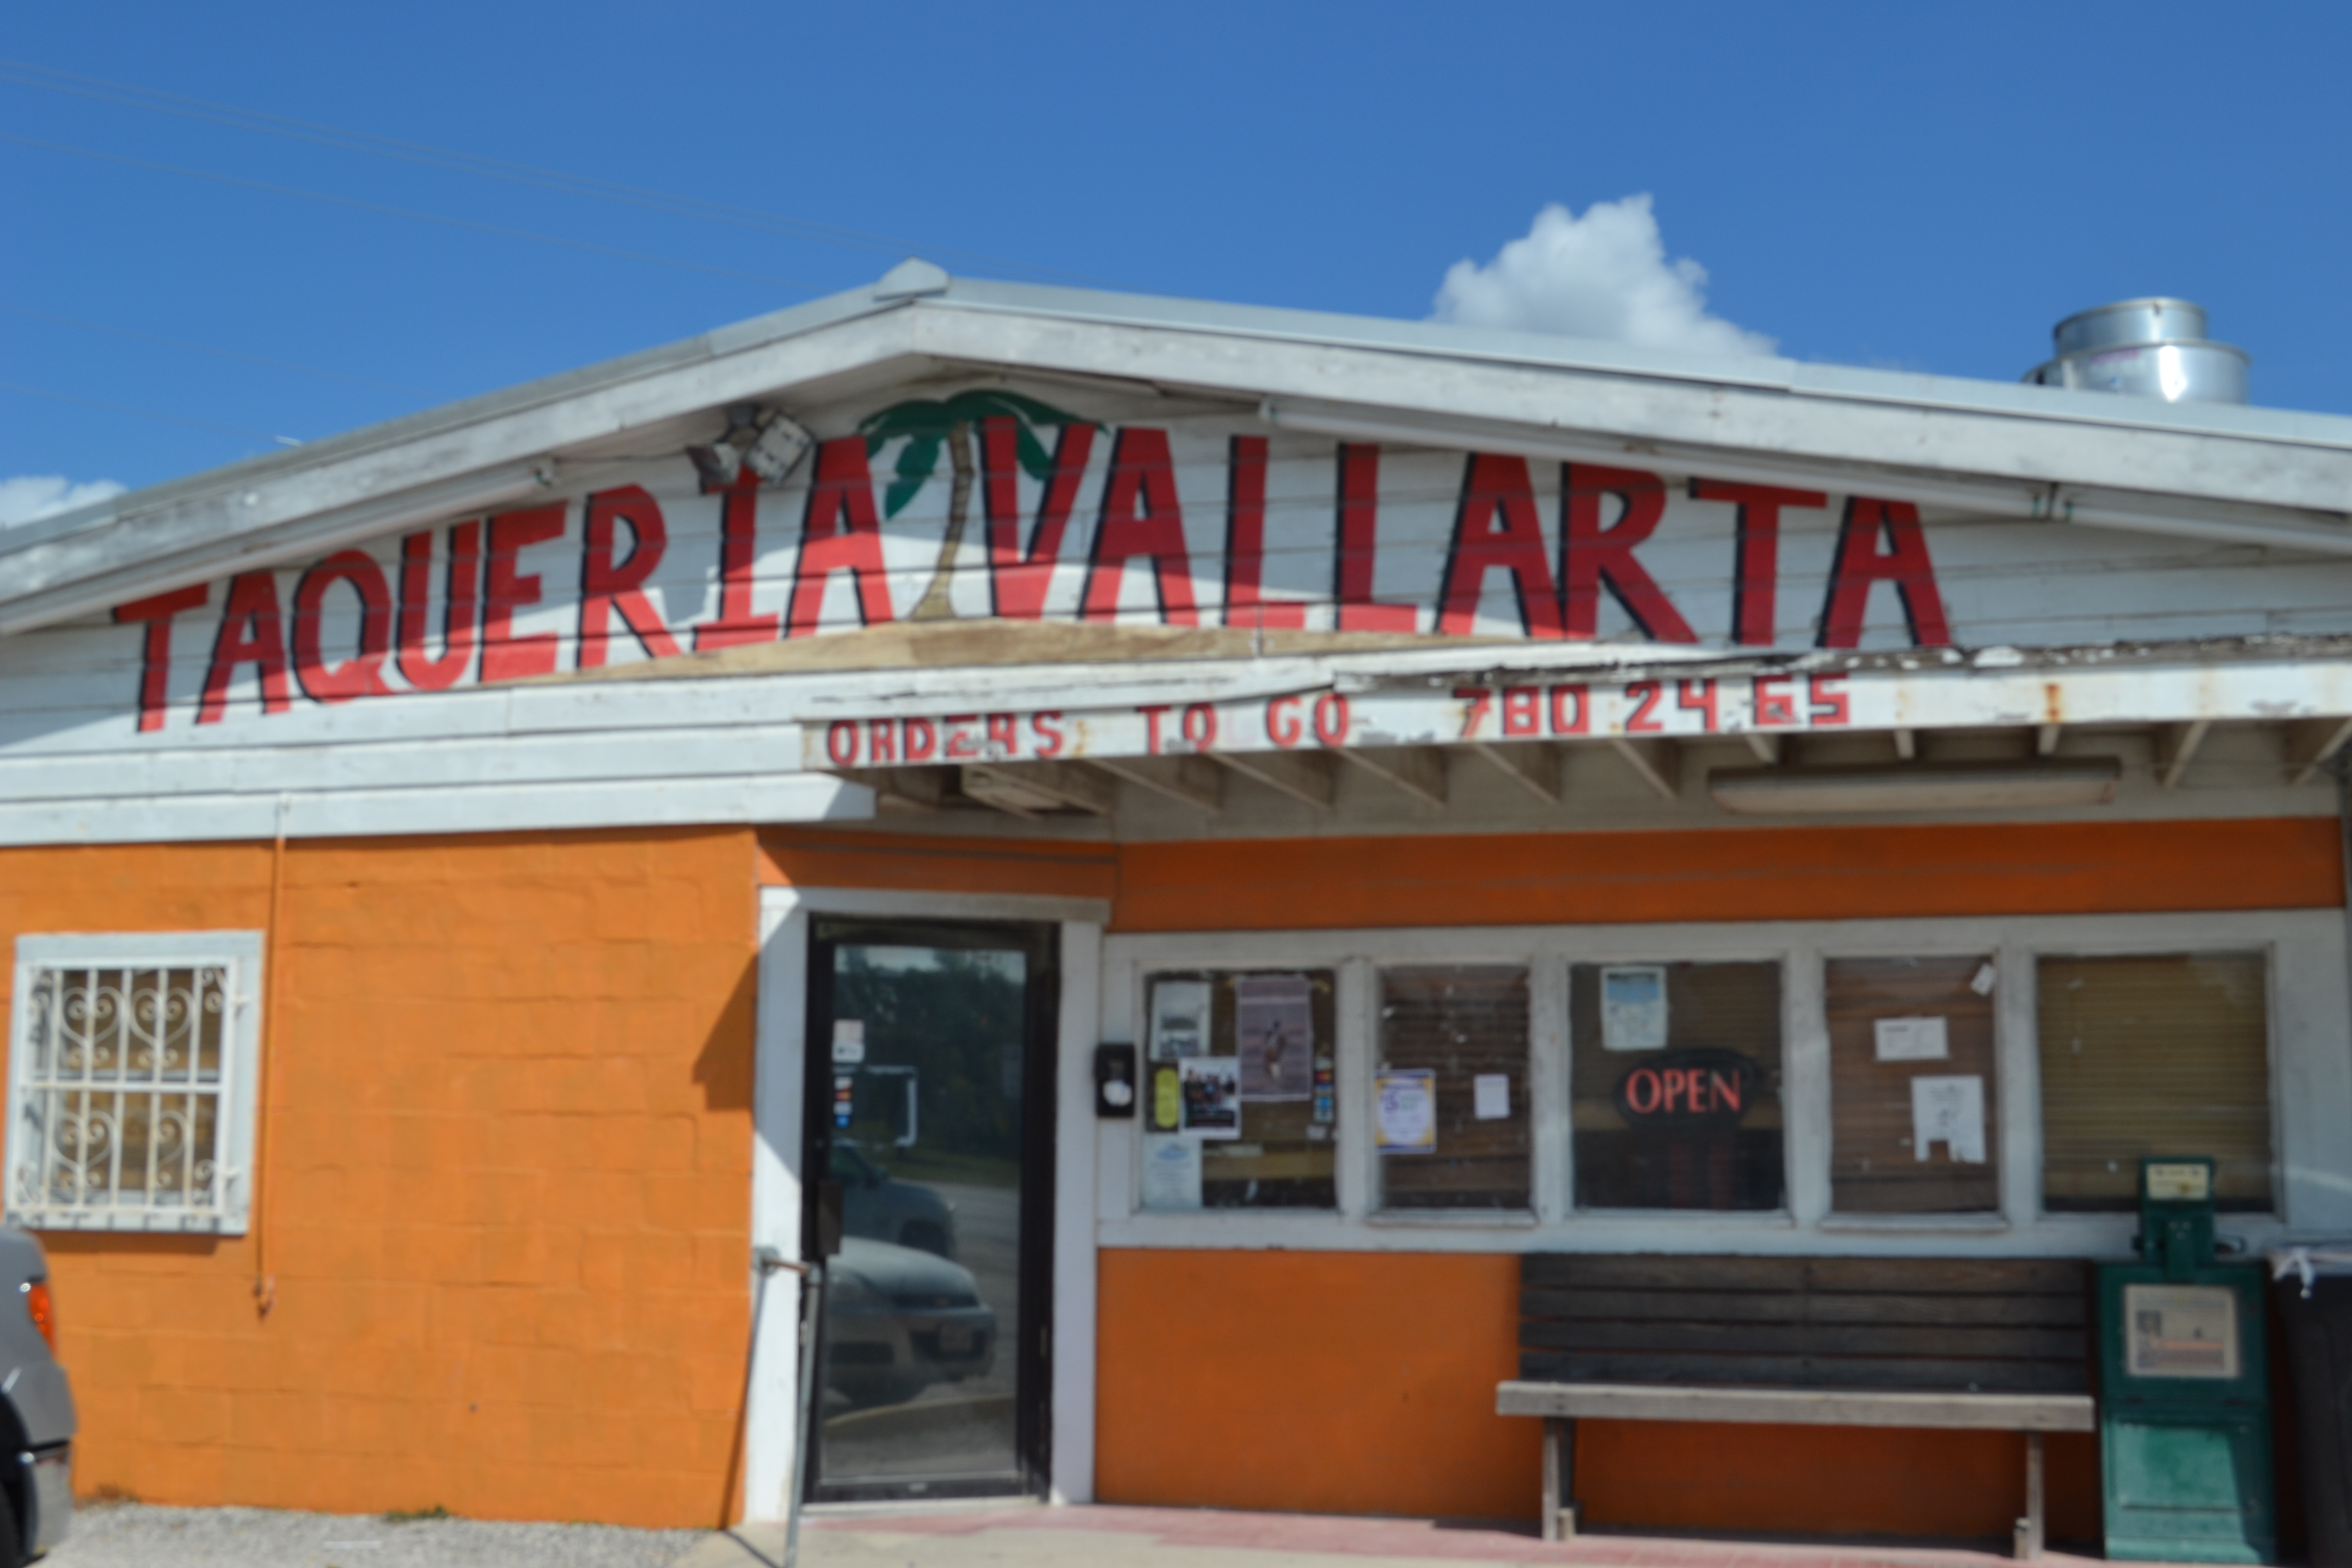 Taqueria Vallarta Texas City Tx